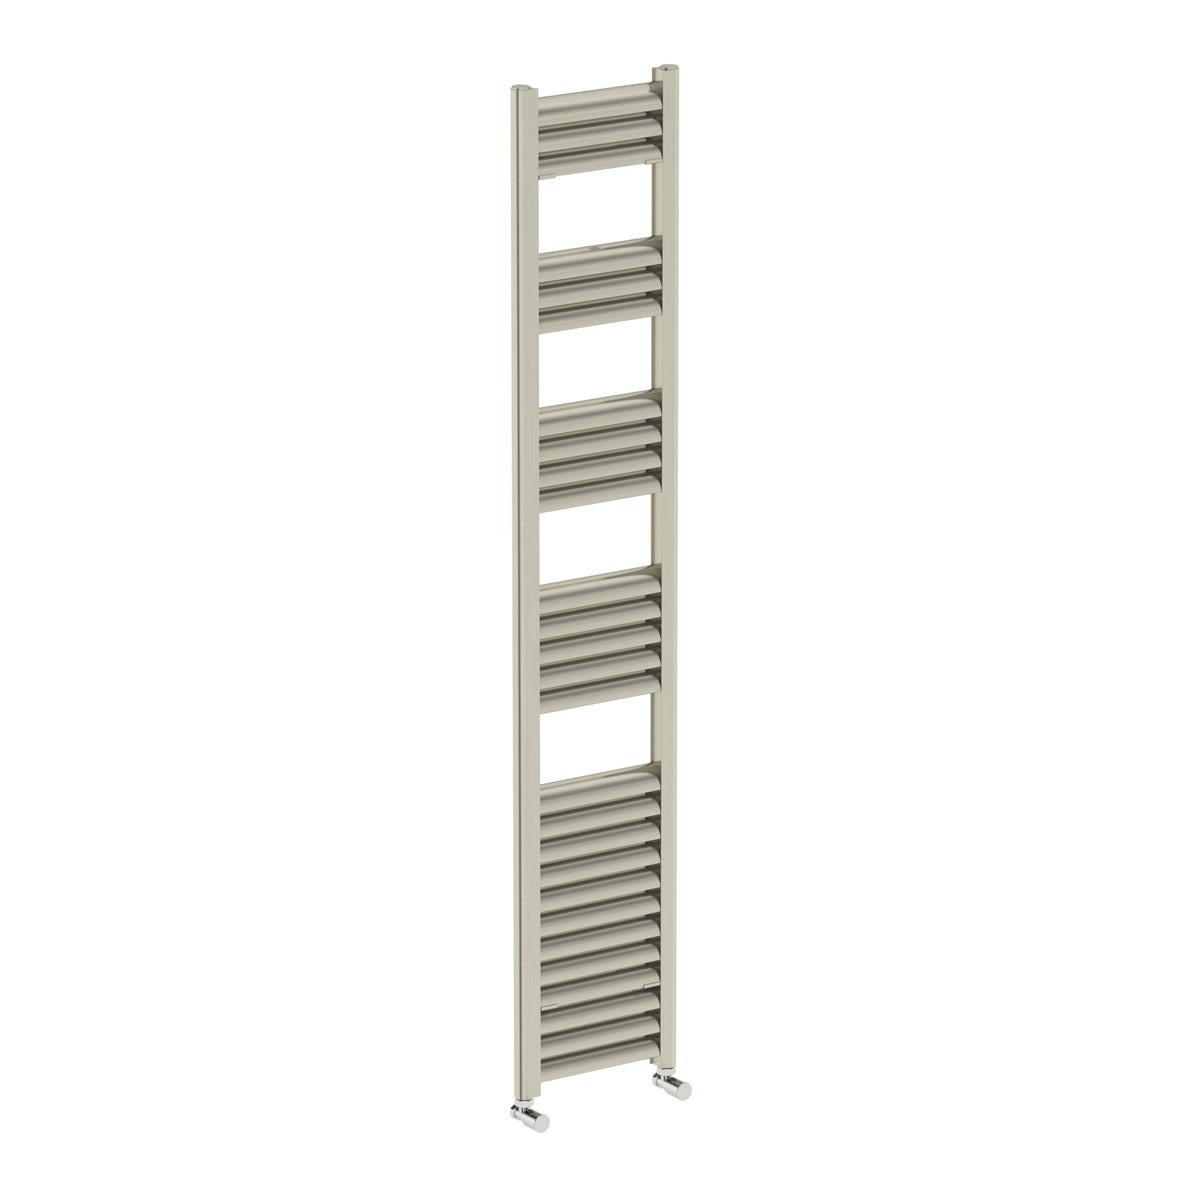 Mode Carter heated towel rail 1600 x 300